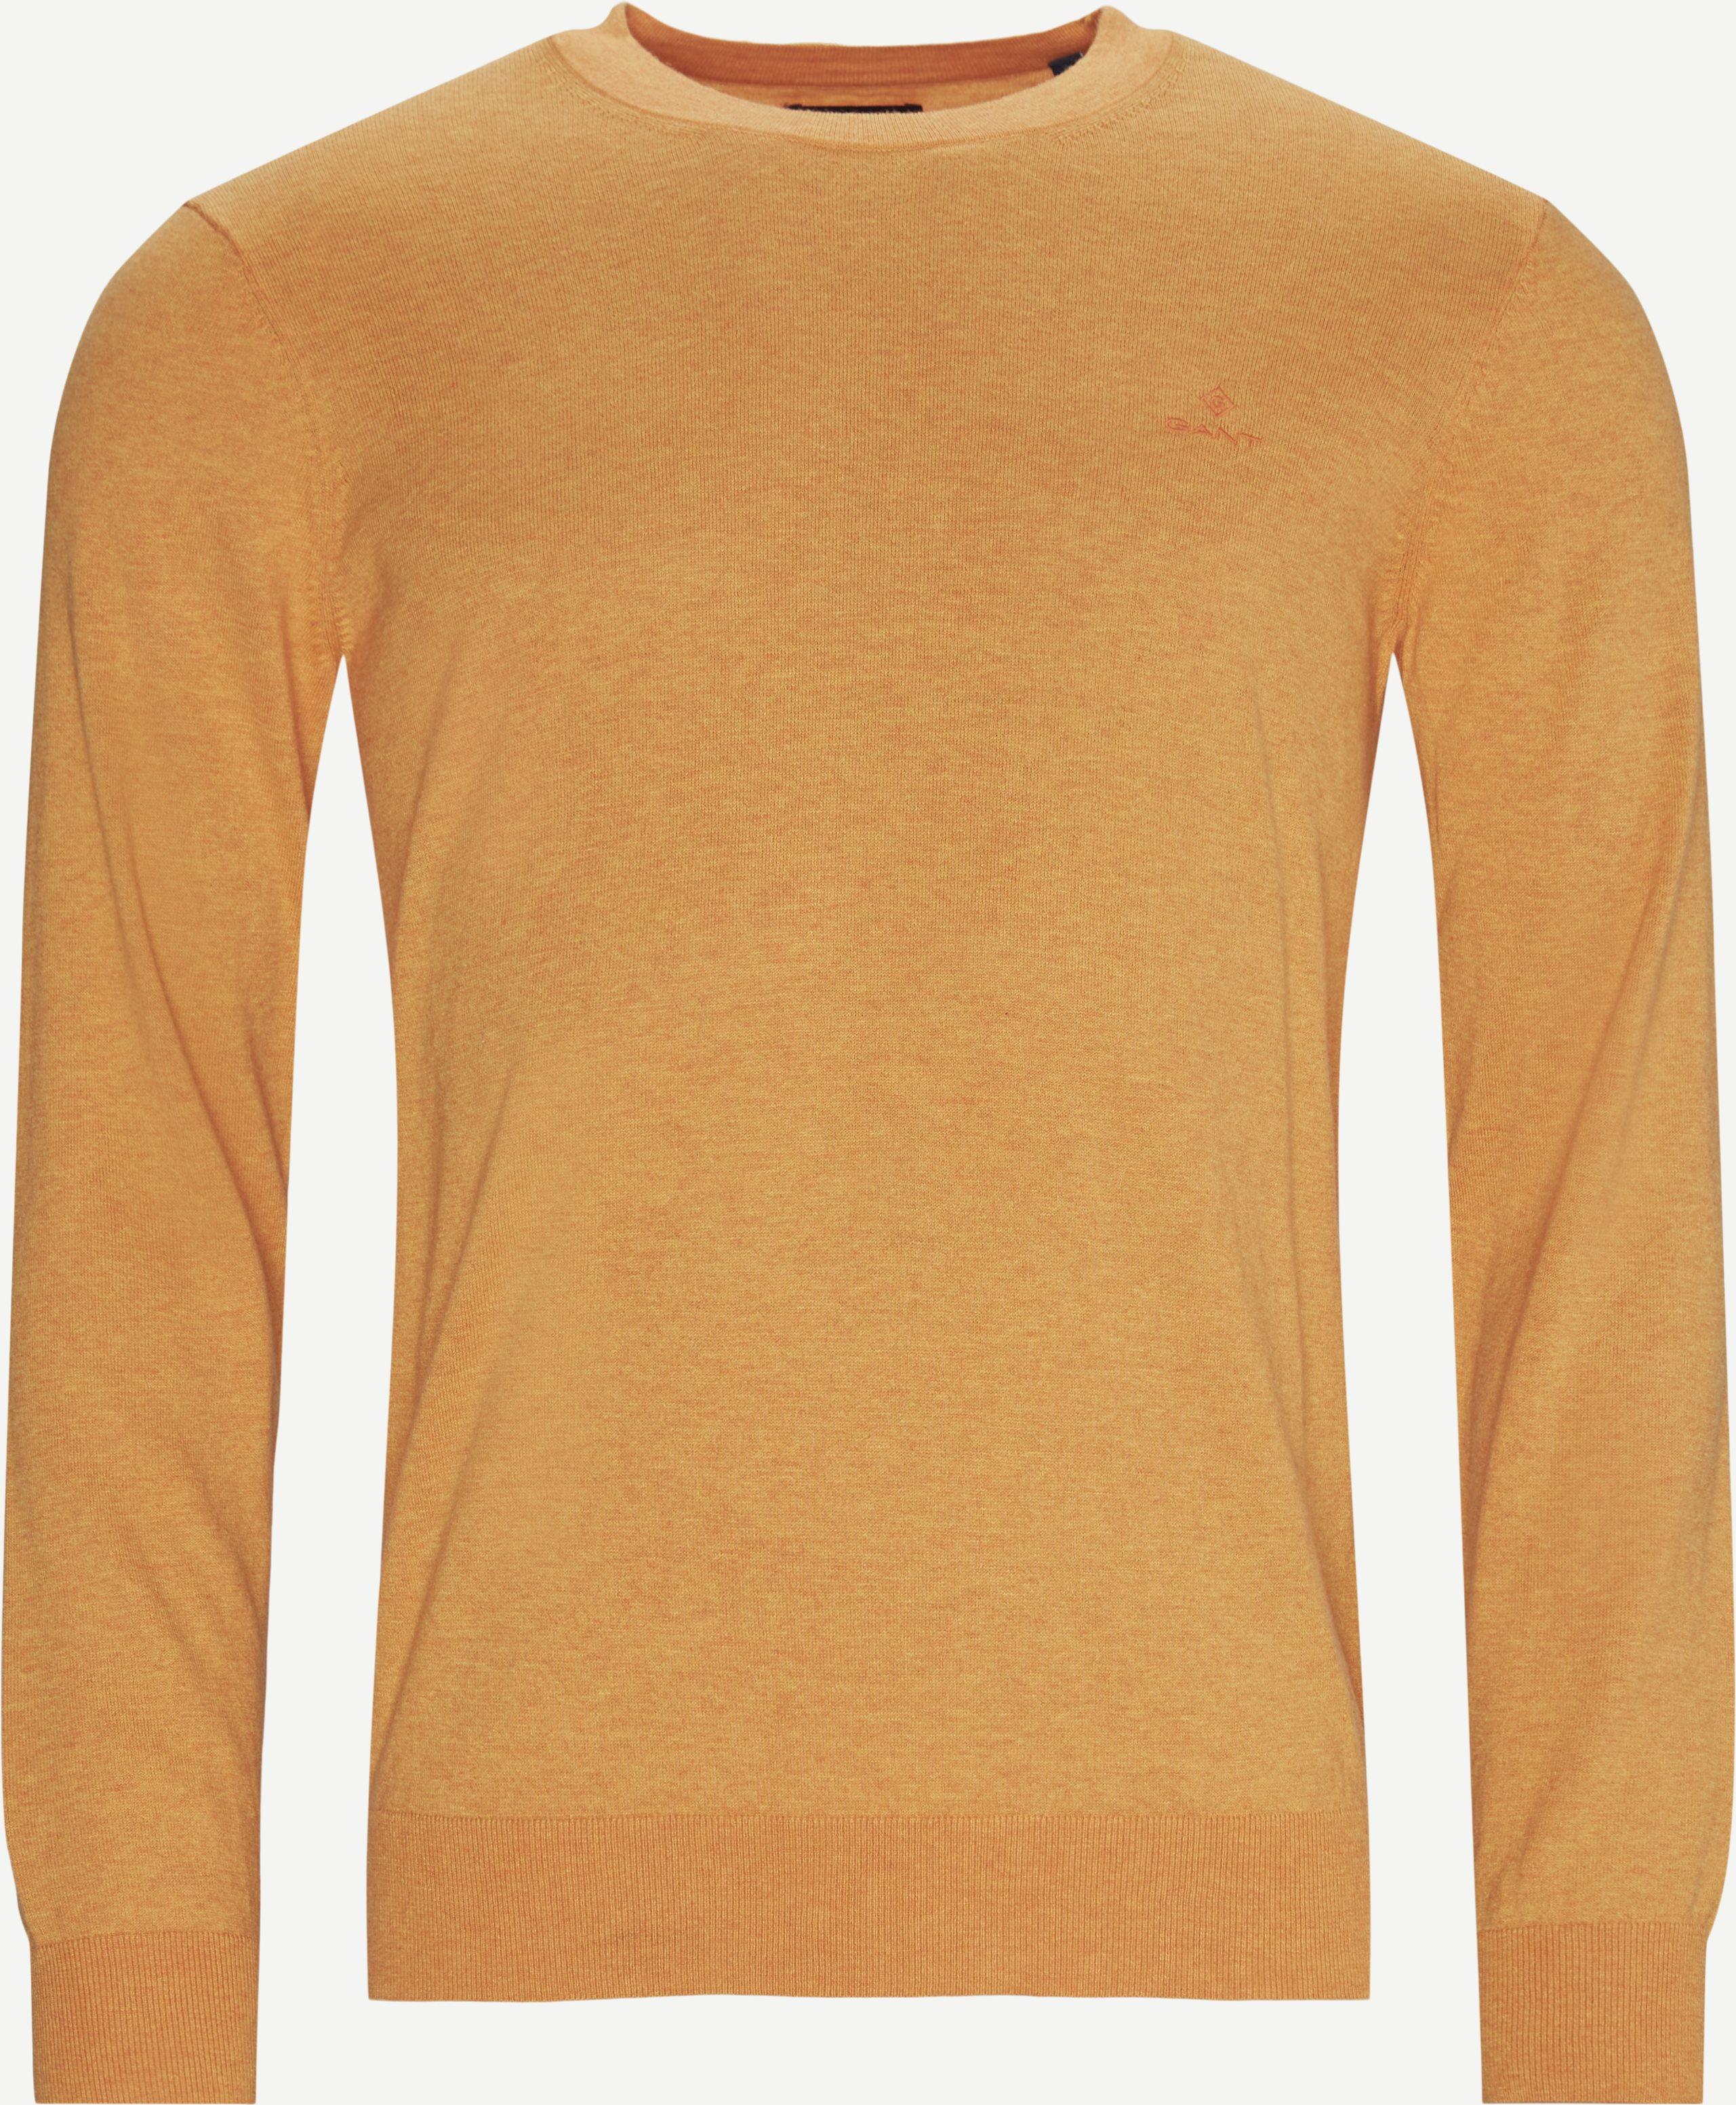 Rundkragenpullover - Regular - Orange